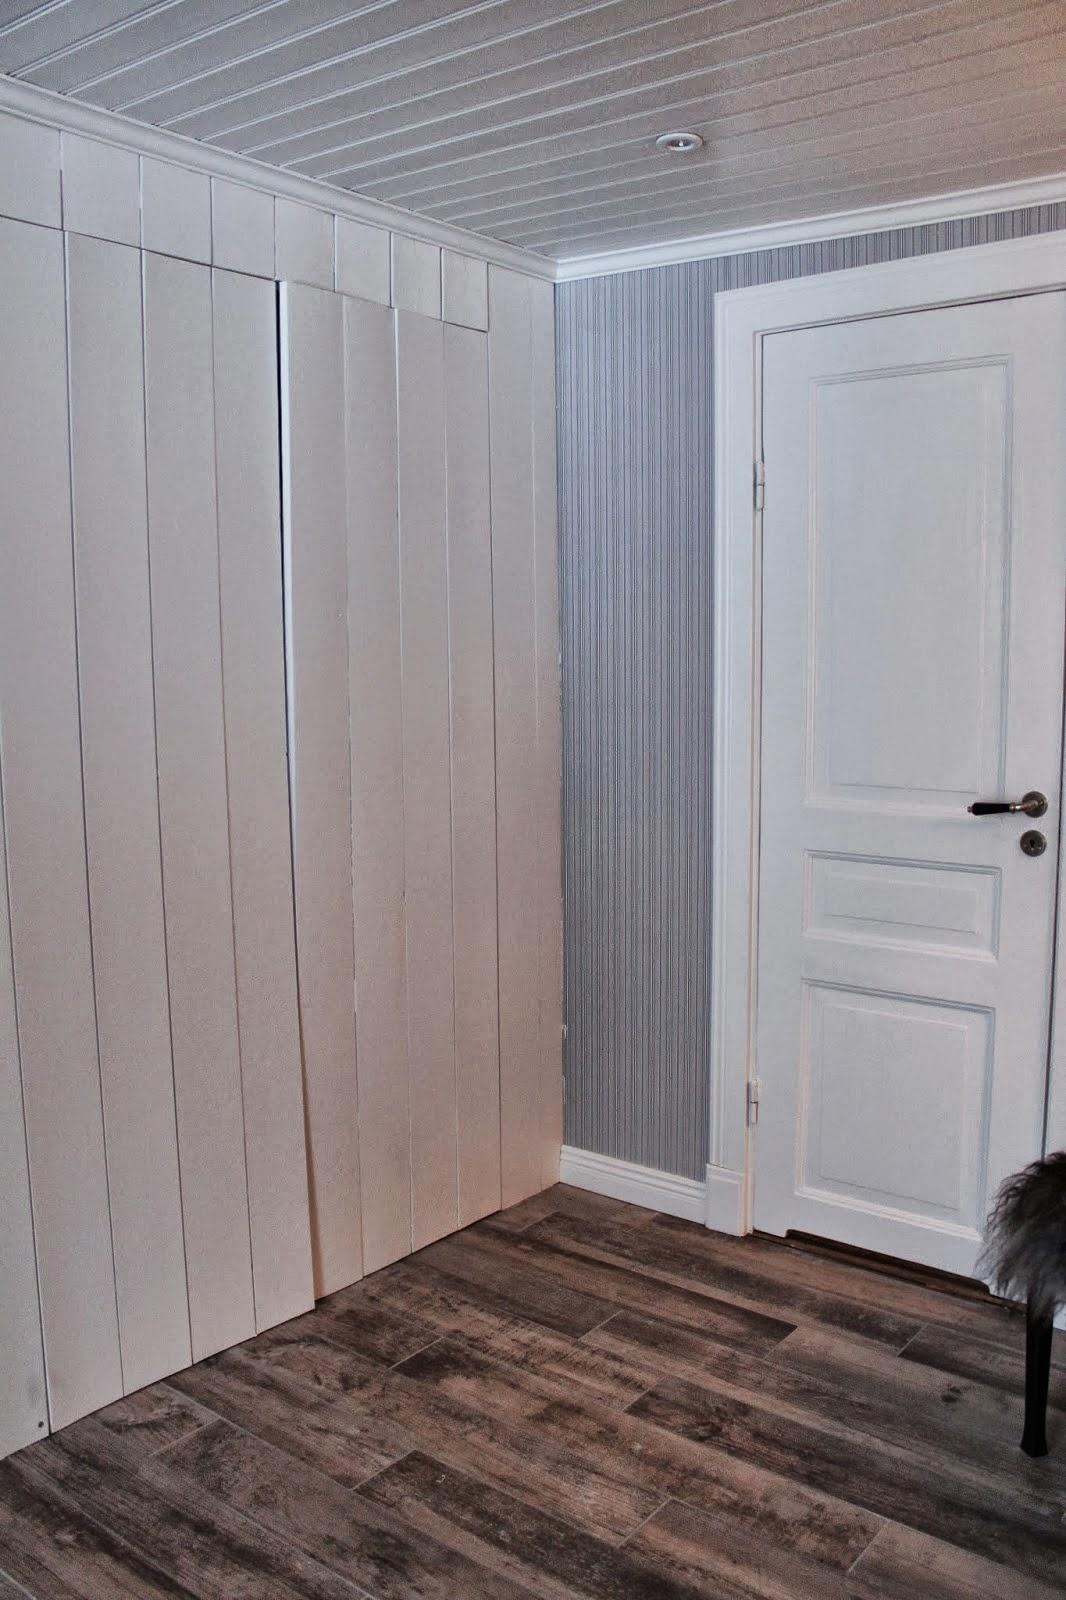 Sallys hus: hjälp i badrummet